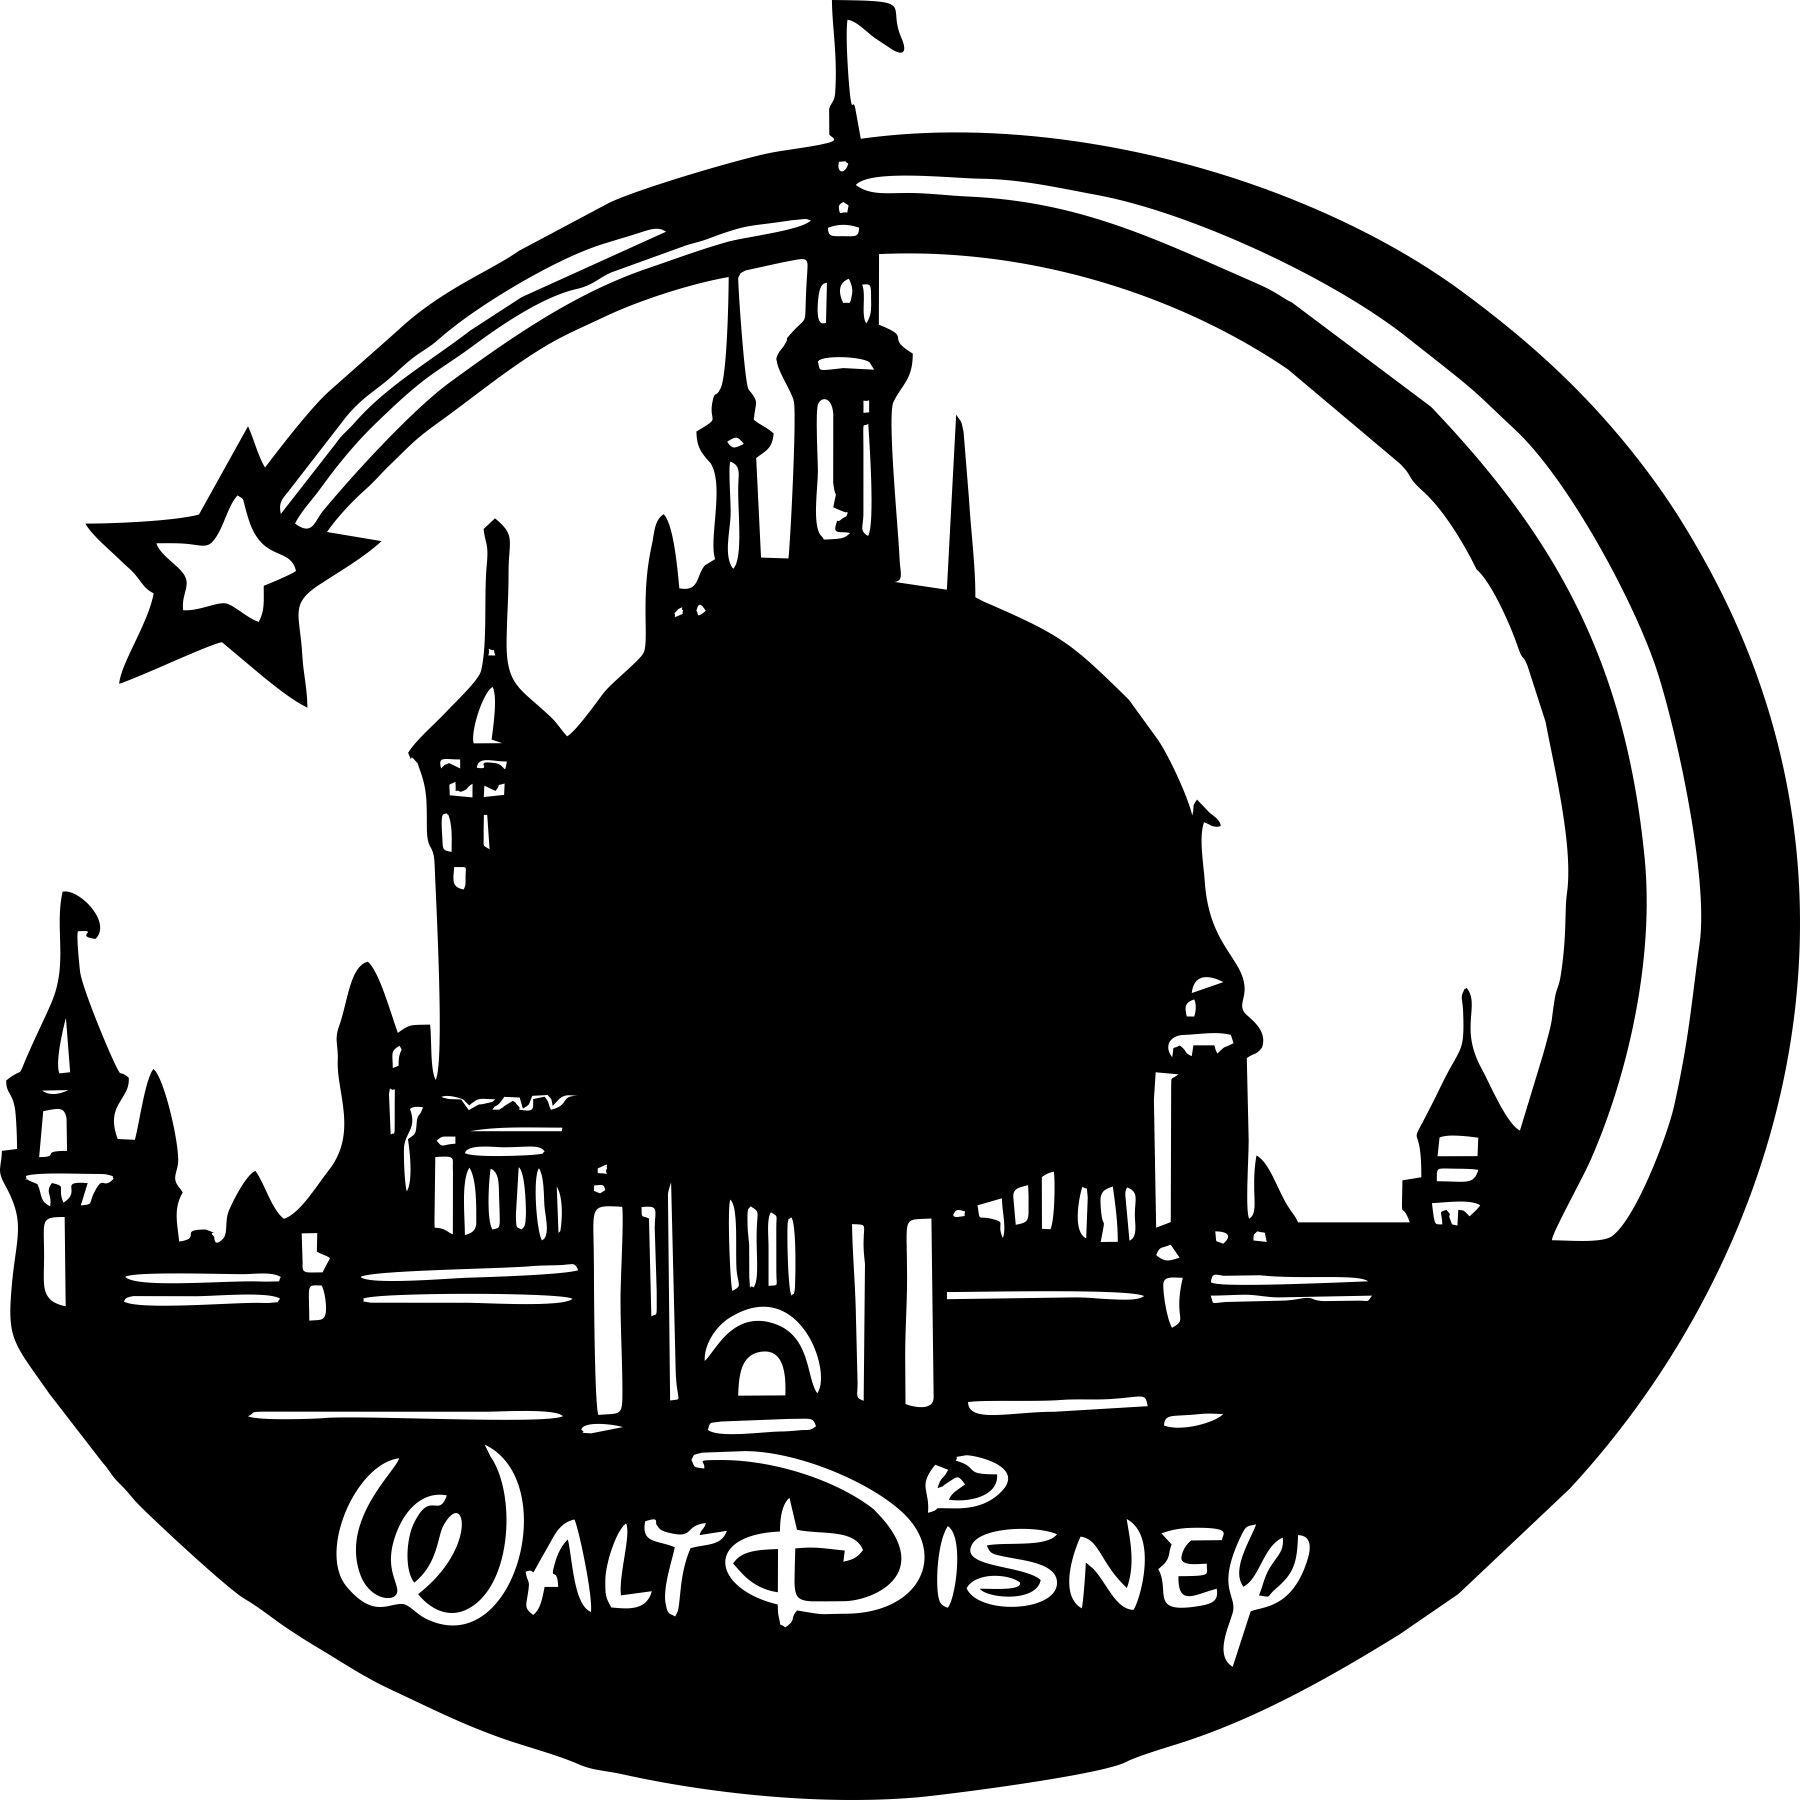 Walt Disney Vinyl Wall Clock Free Vector